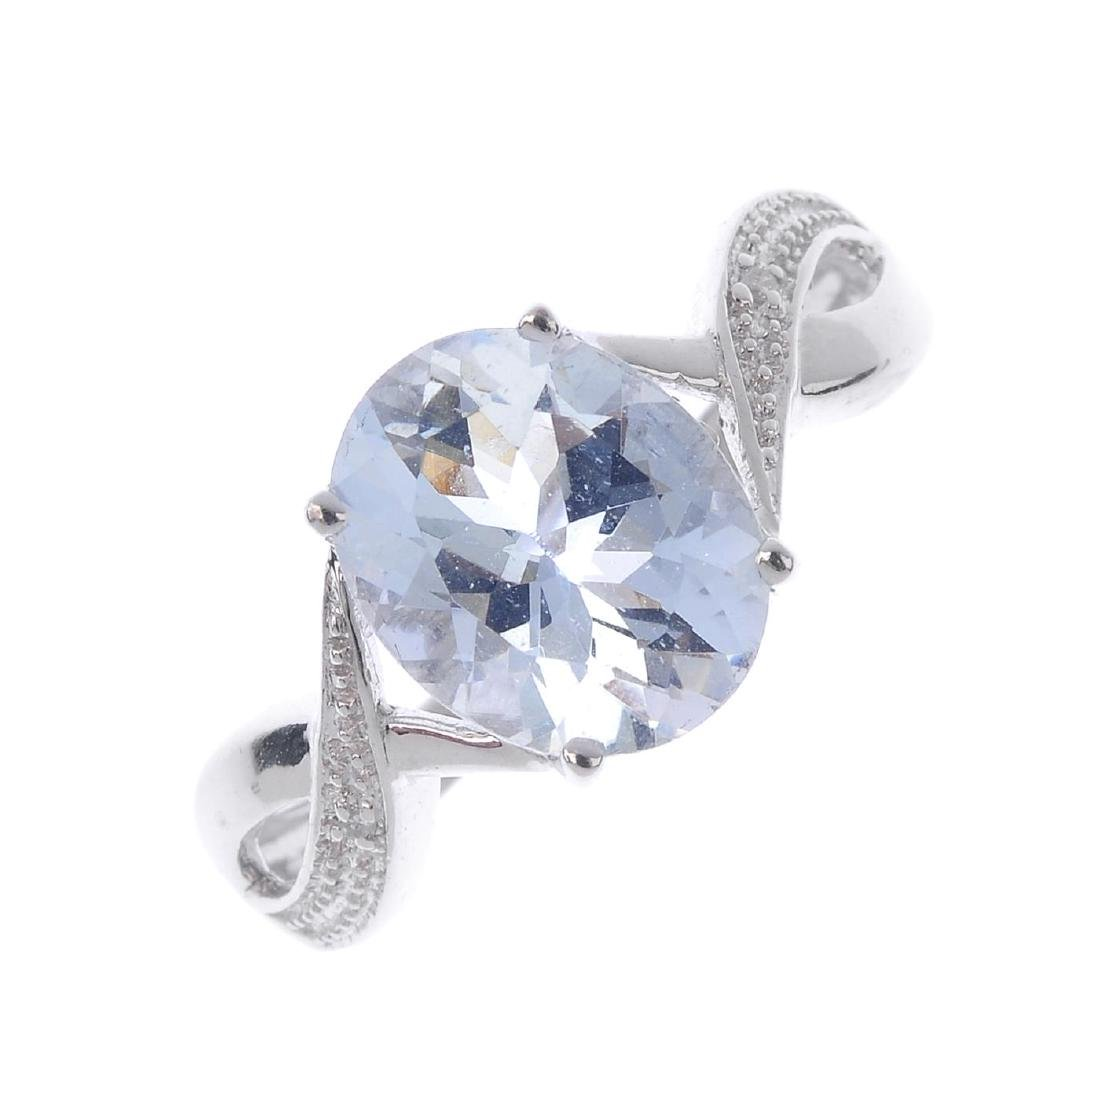 A 9ct gold aquamarine single-stone ring. The oval-shape